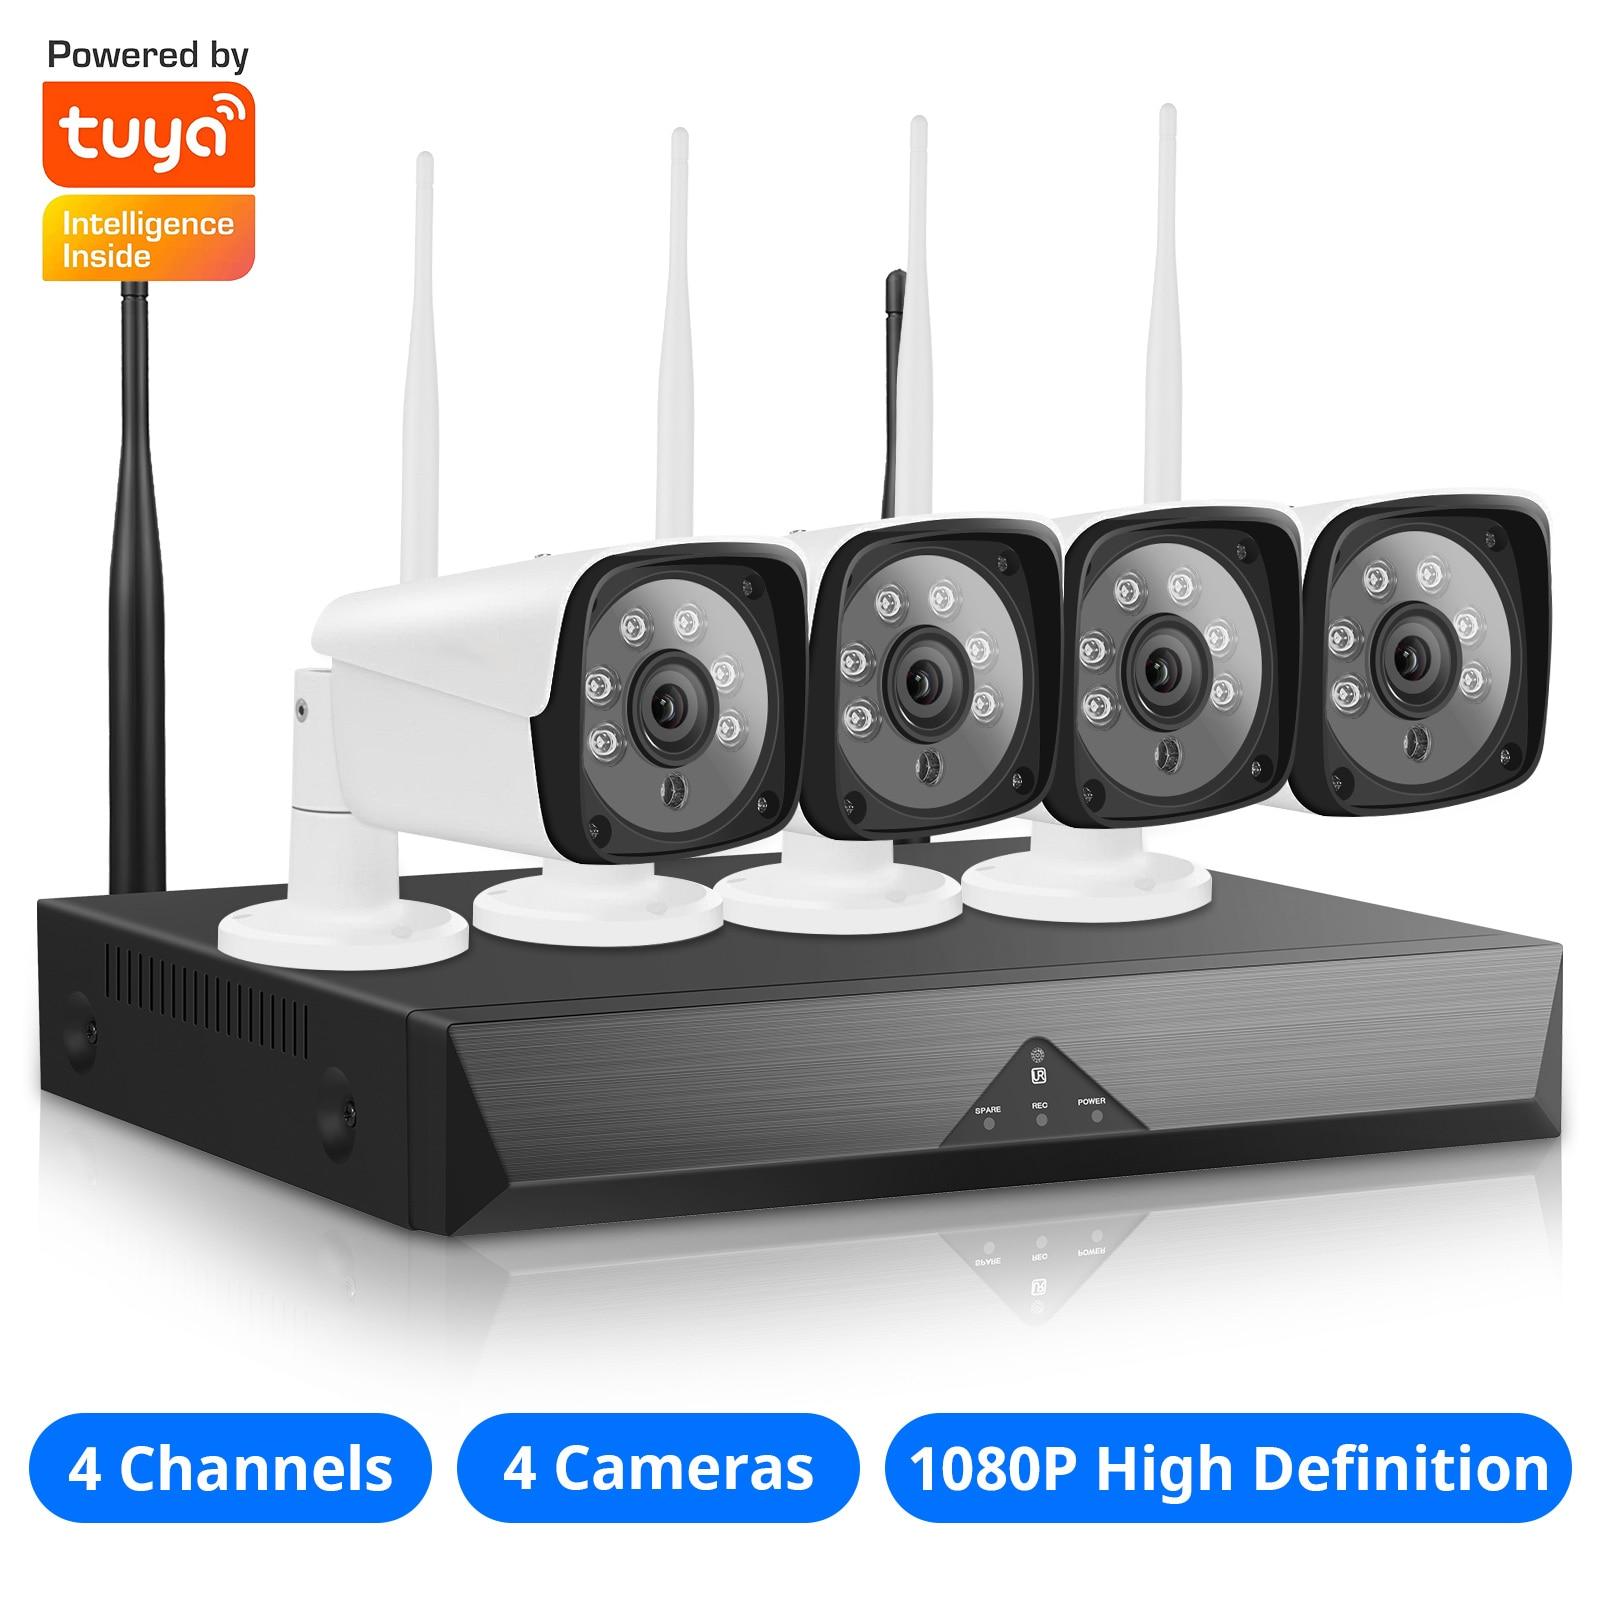 1080P 4CH نظام كاميرا أمان لاسلكية ، 4 قناة NVR مع 4 قطعة كاميرا مراقبة أمن الوطن واي فاي دعم الرؤية الليلية